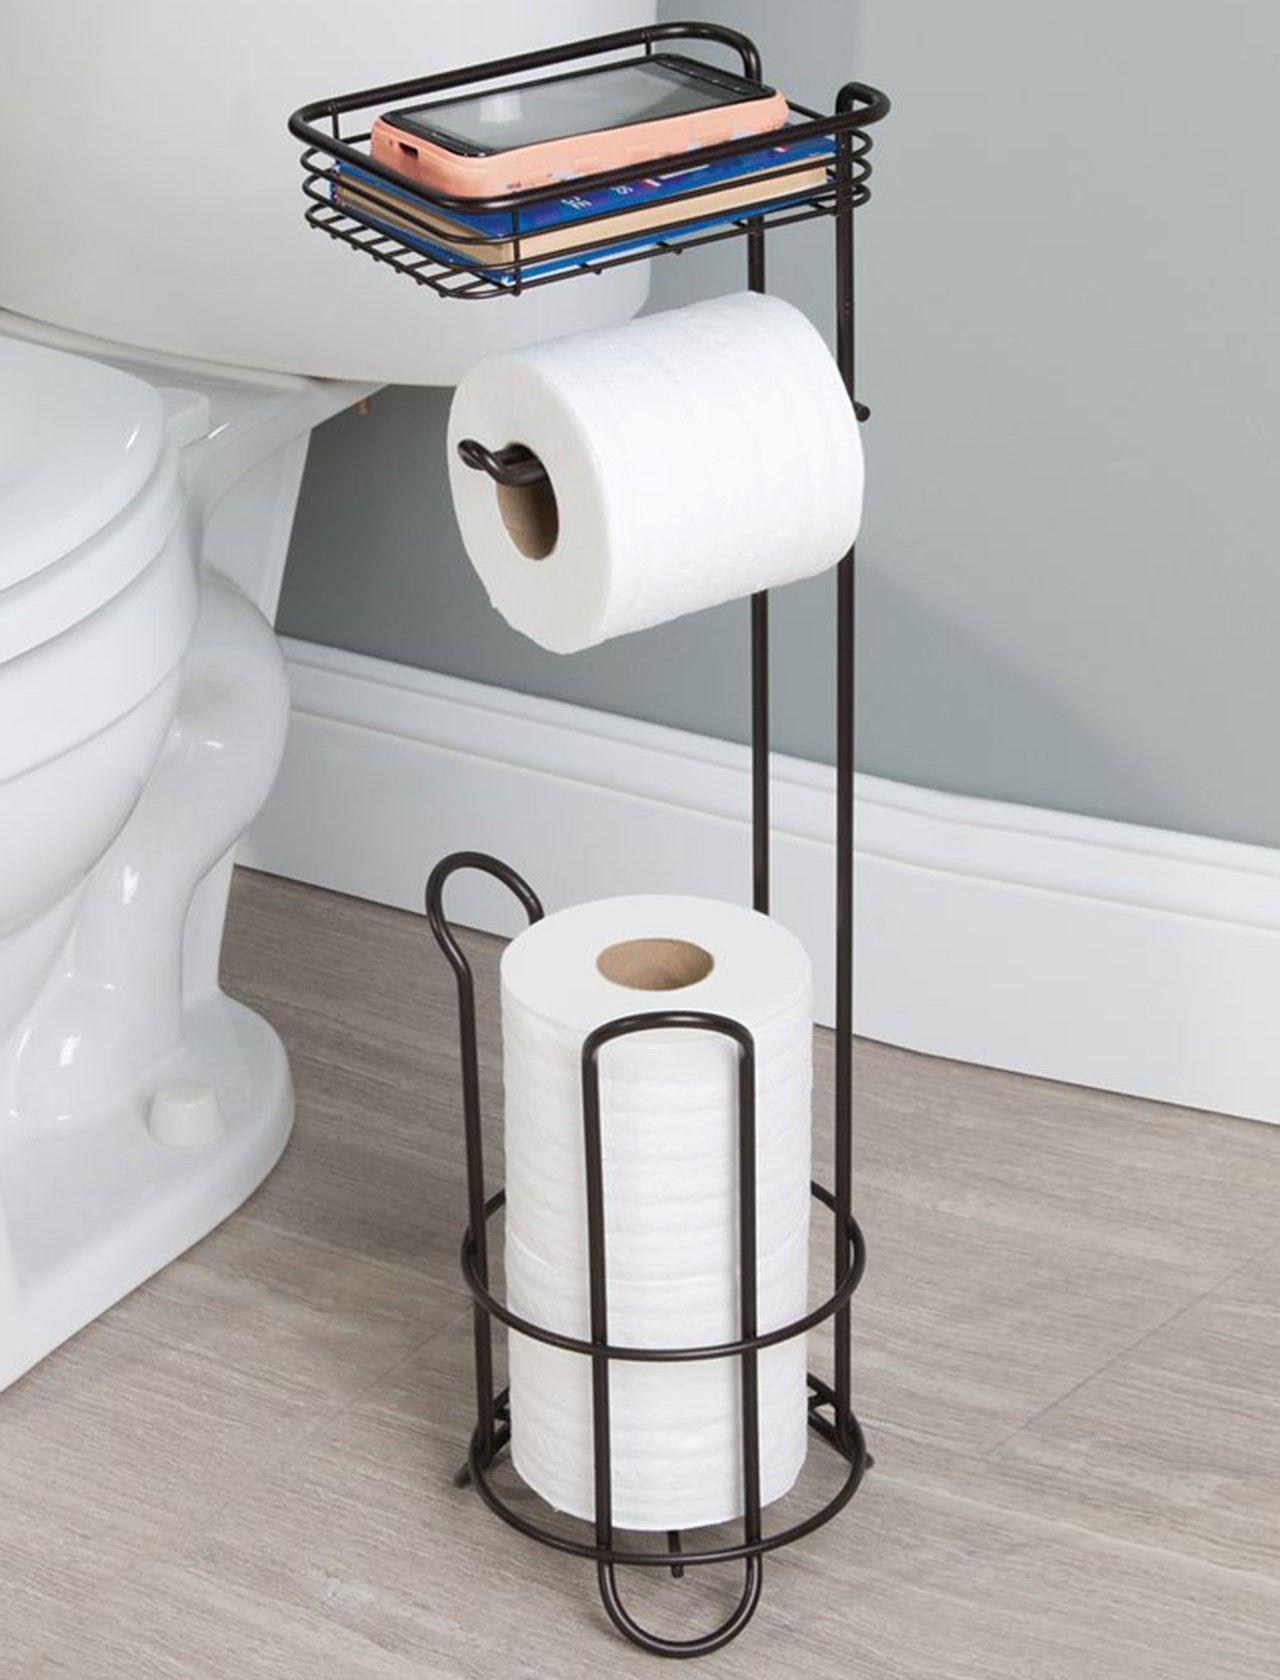 10 Creative And Easy Diy Toilet Paper Holders Bathroom Toilet